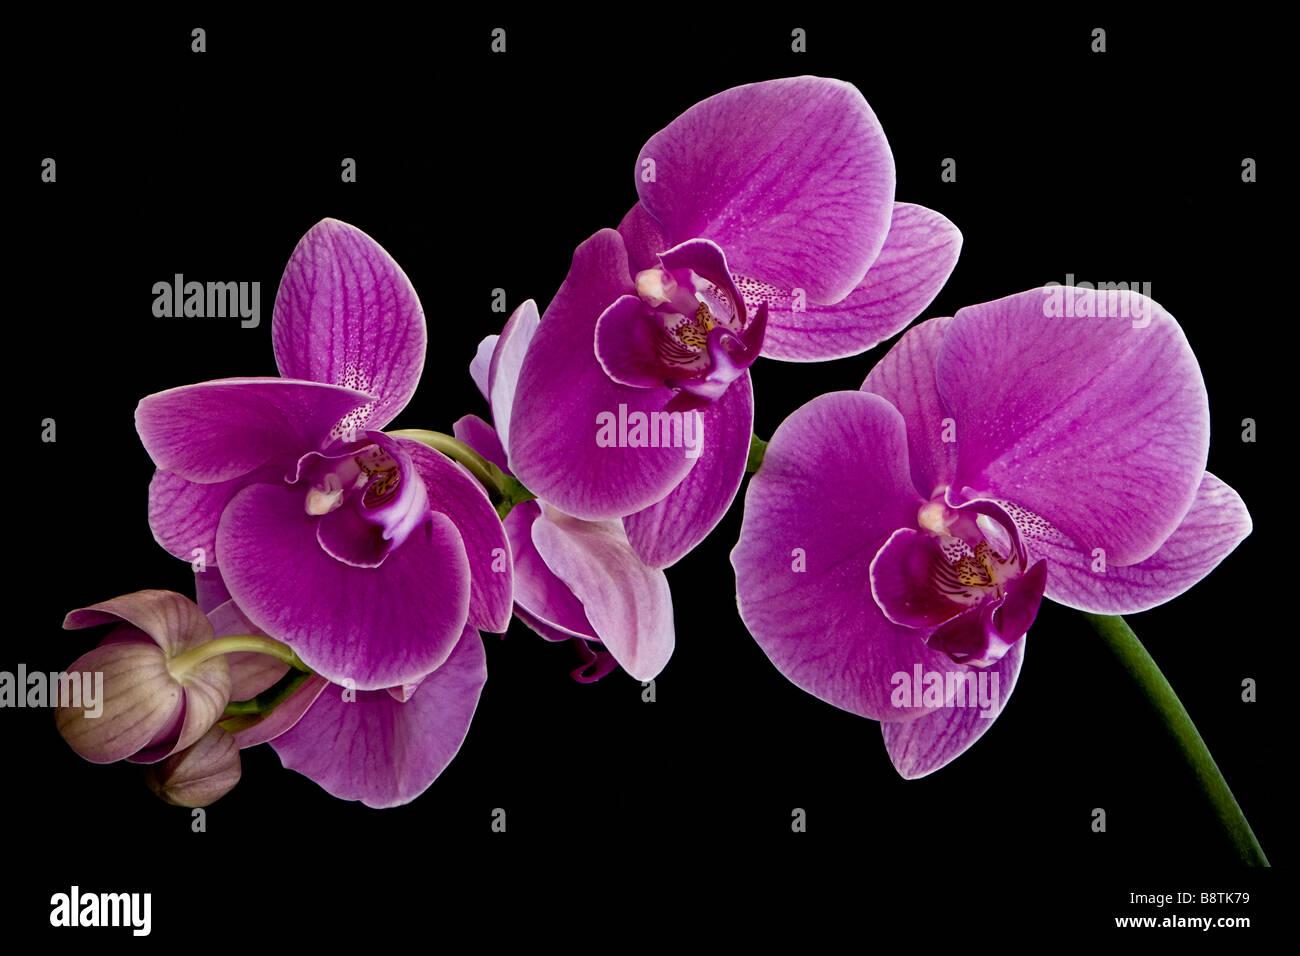 Purple Phalaenopsis Orchid Blossoms - Stock Image